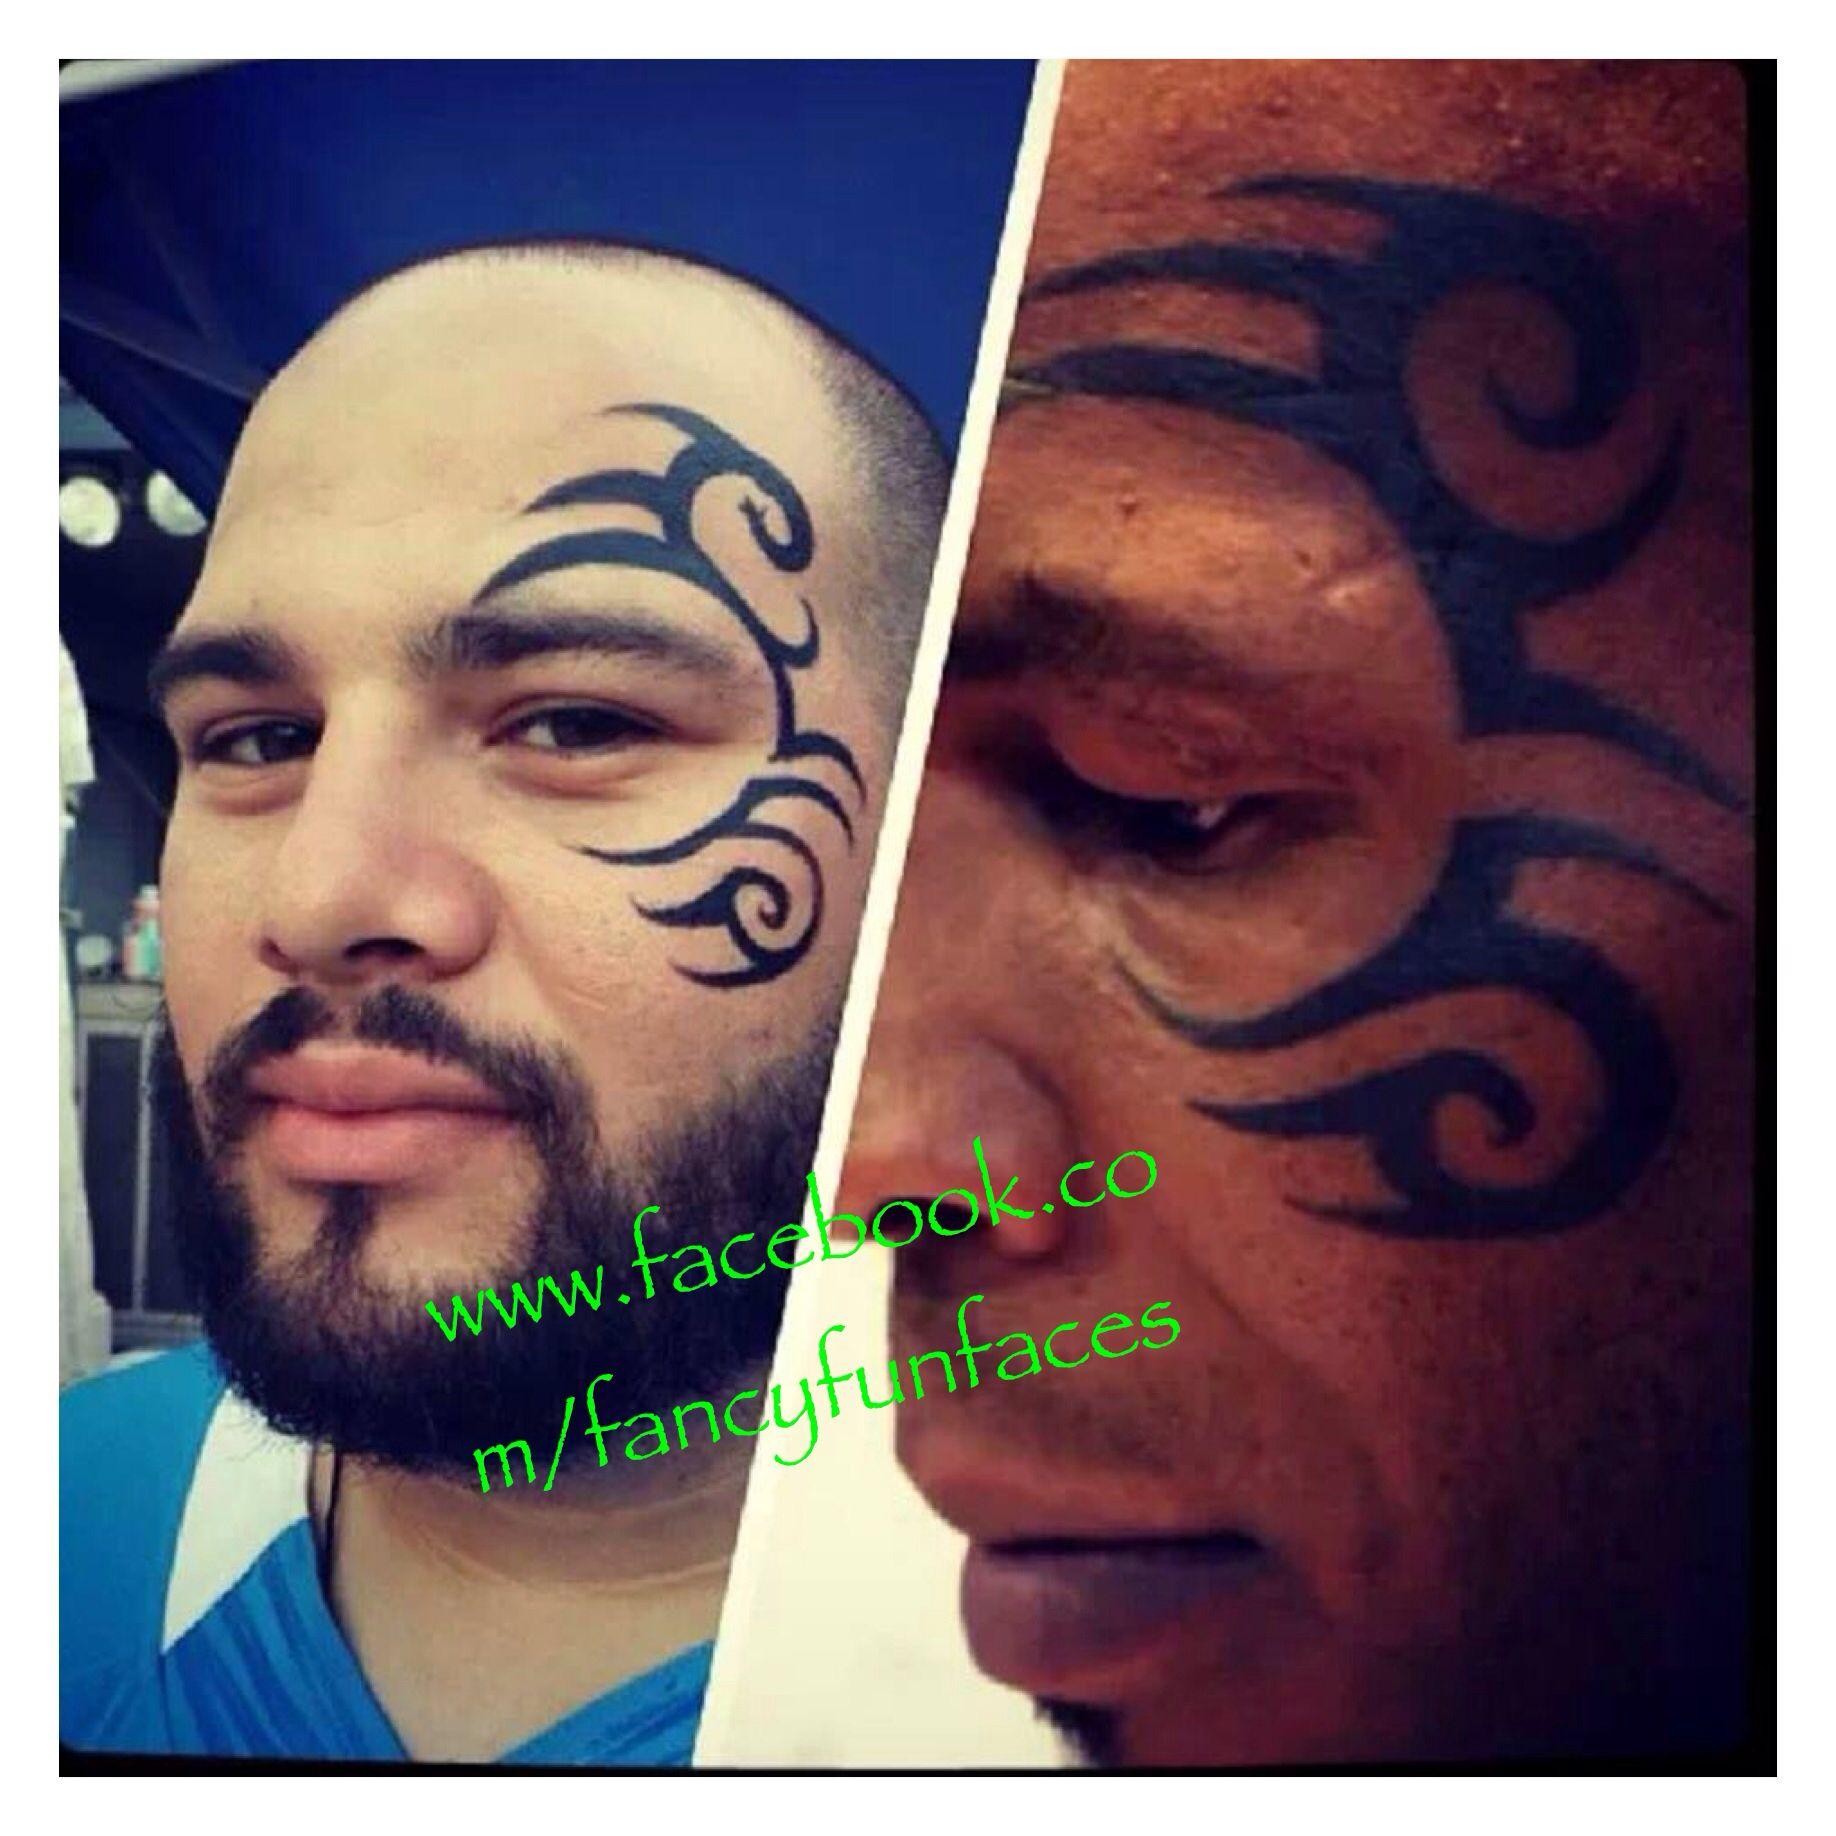 c3043c593 Replica of Mike Tyson face tattoo   Fancy Fun Faces by Yolanda ...